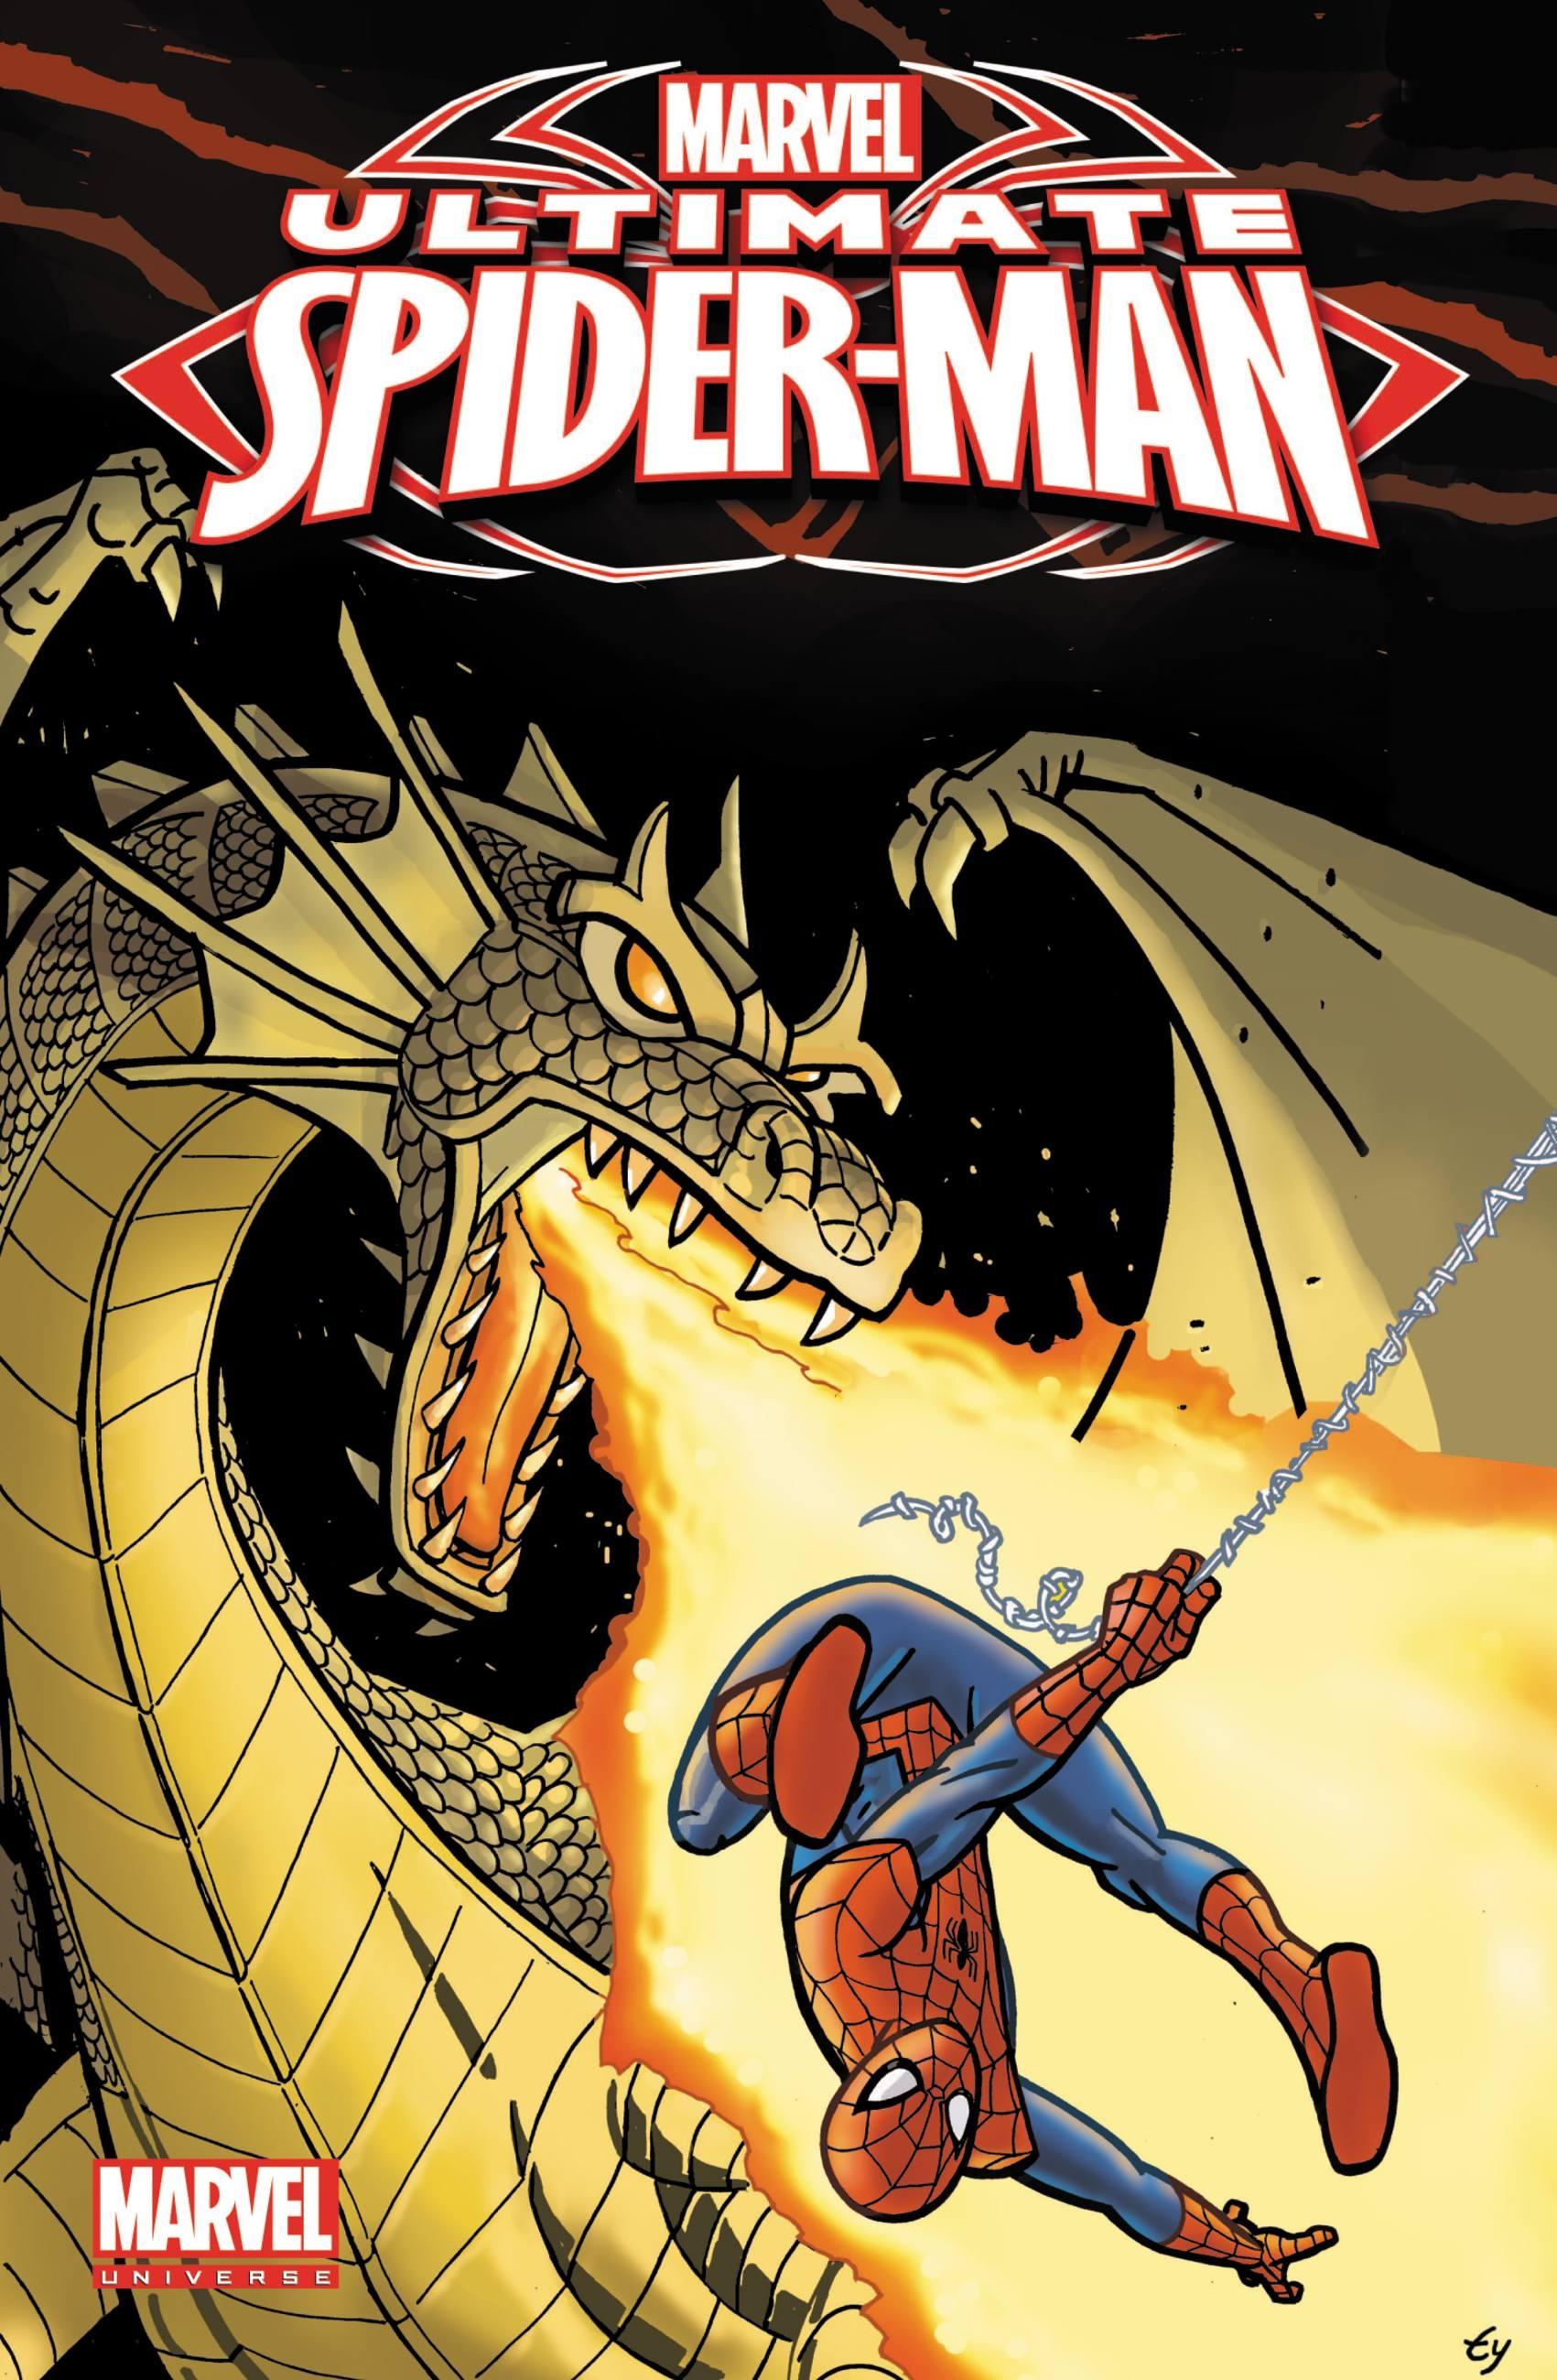 Marvel Universe Ultimate Spider-Man - Volume 2 marvel universe by chris claremont omnibus